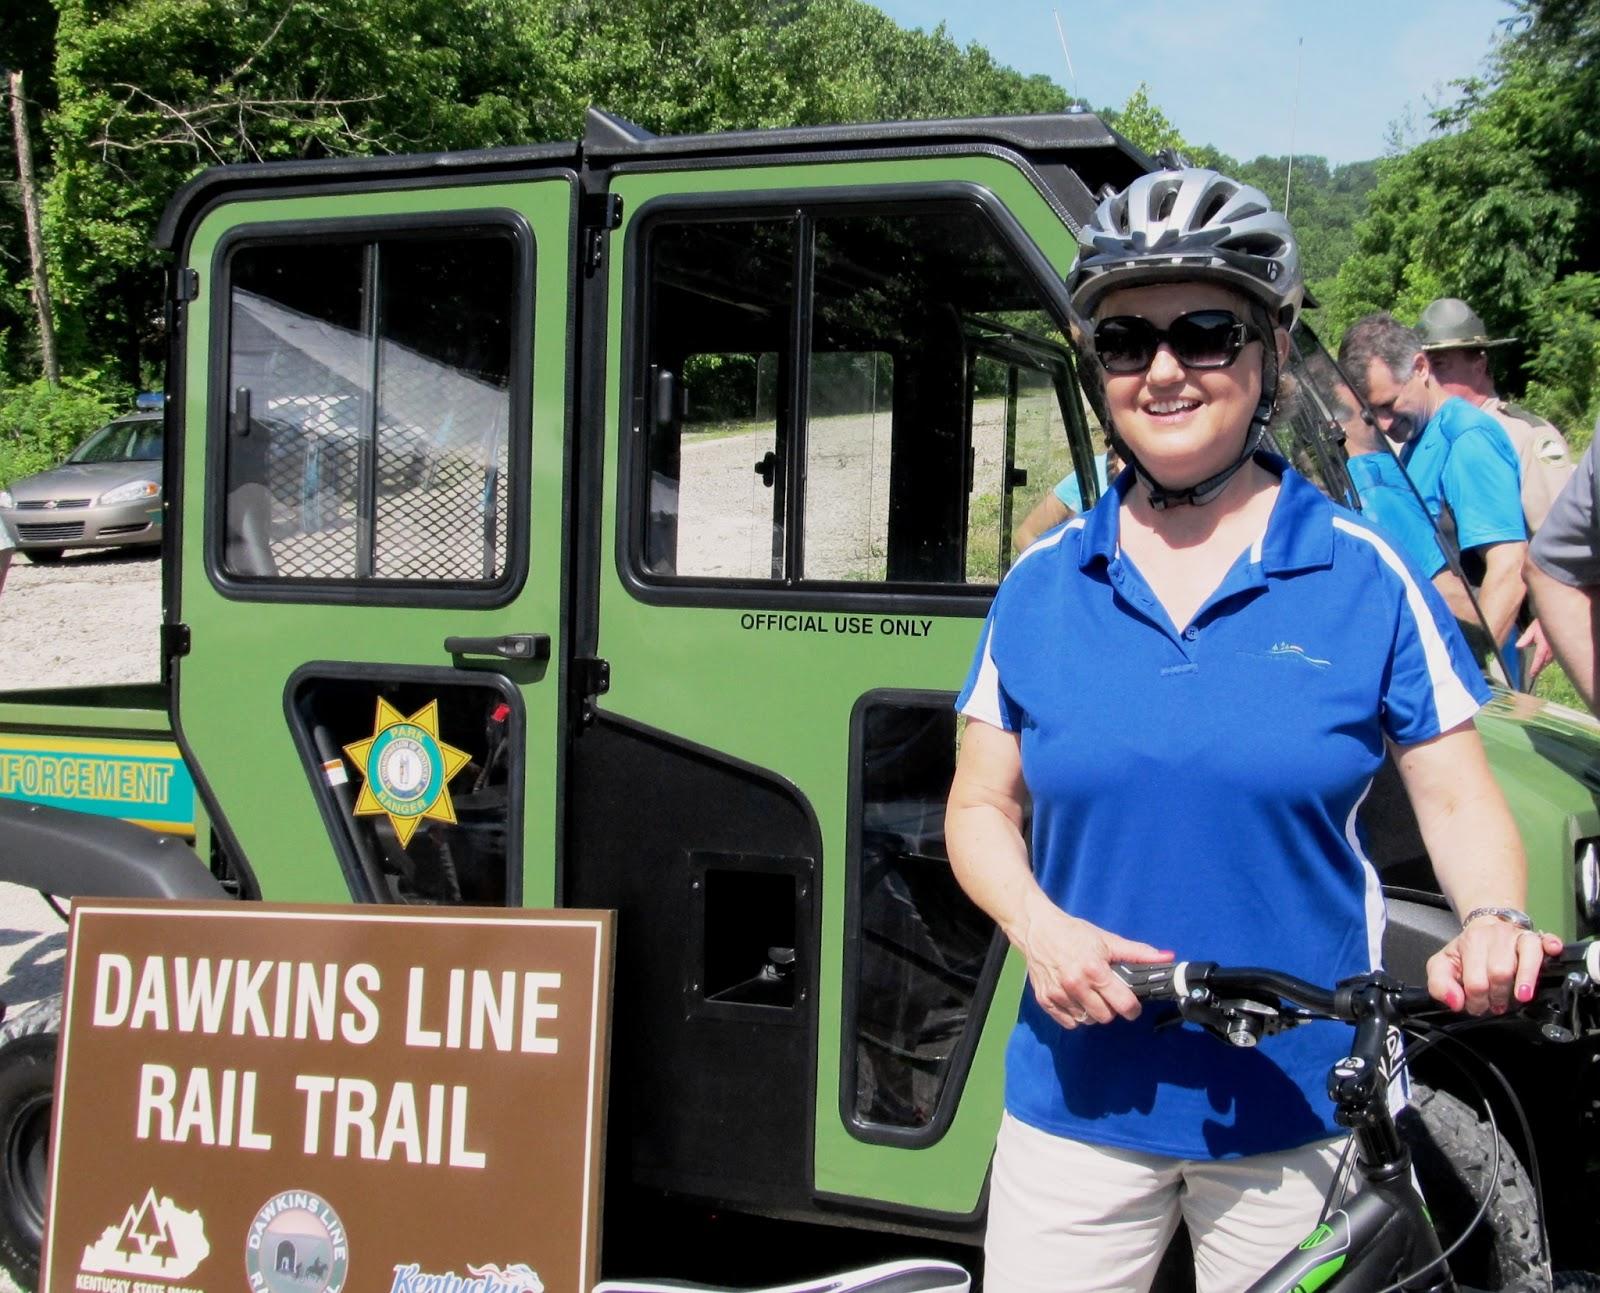 Kentucky State Naturalist's Blog: Dawkins Line Rail Trail ...